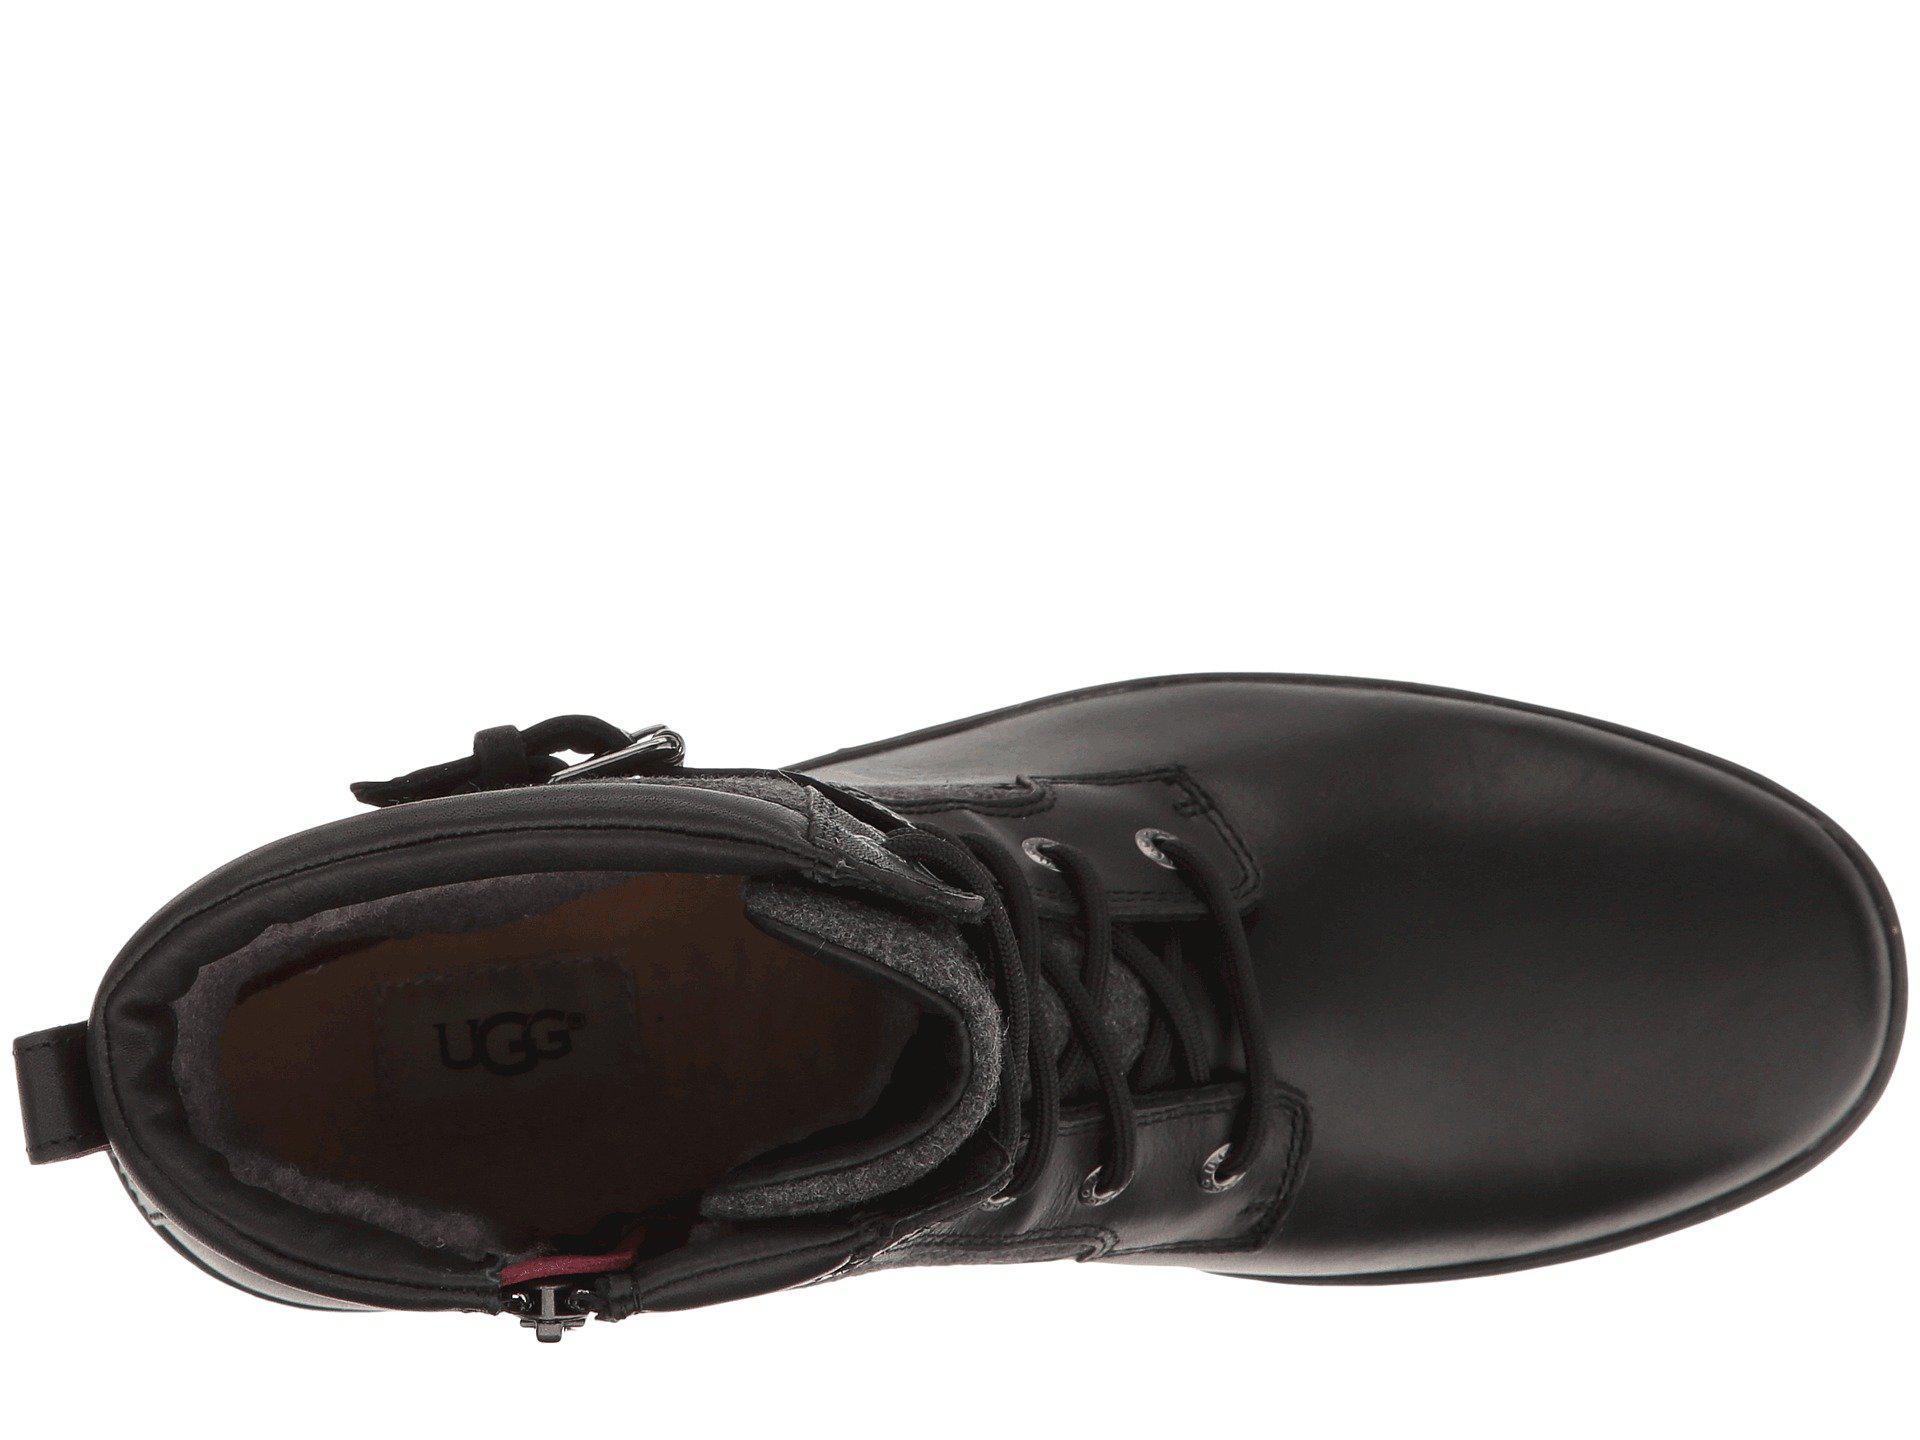 e3da97cbbce Lyst - UGG Kesey (chestnut) Women's Boots in Black